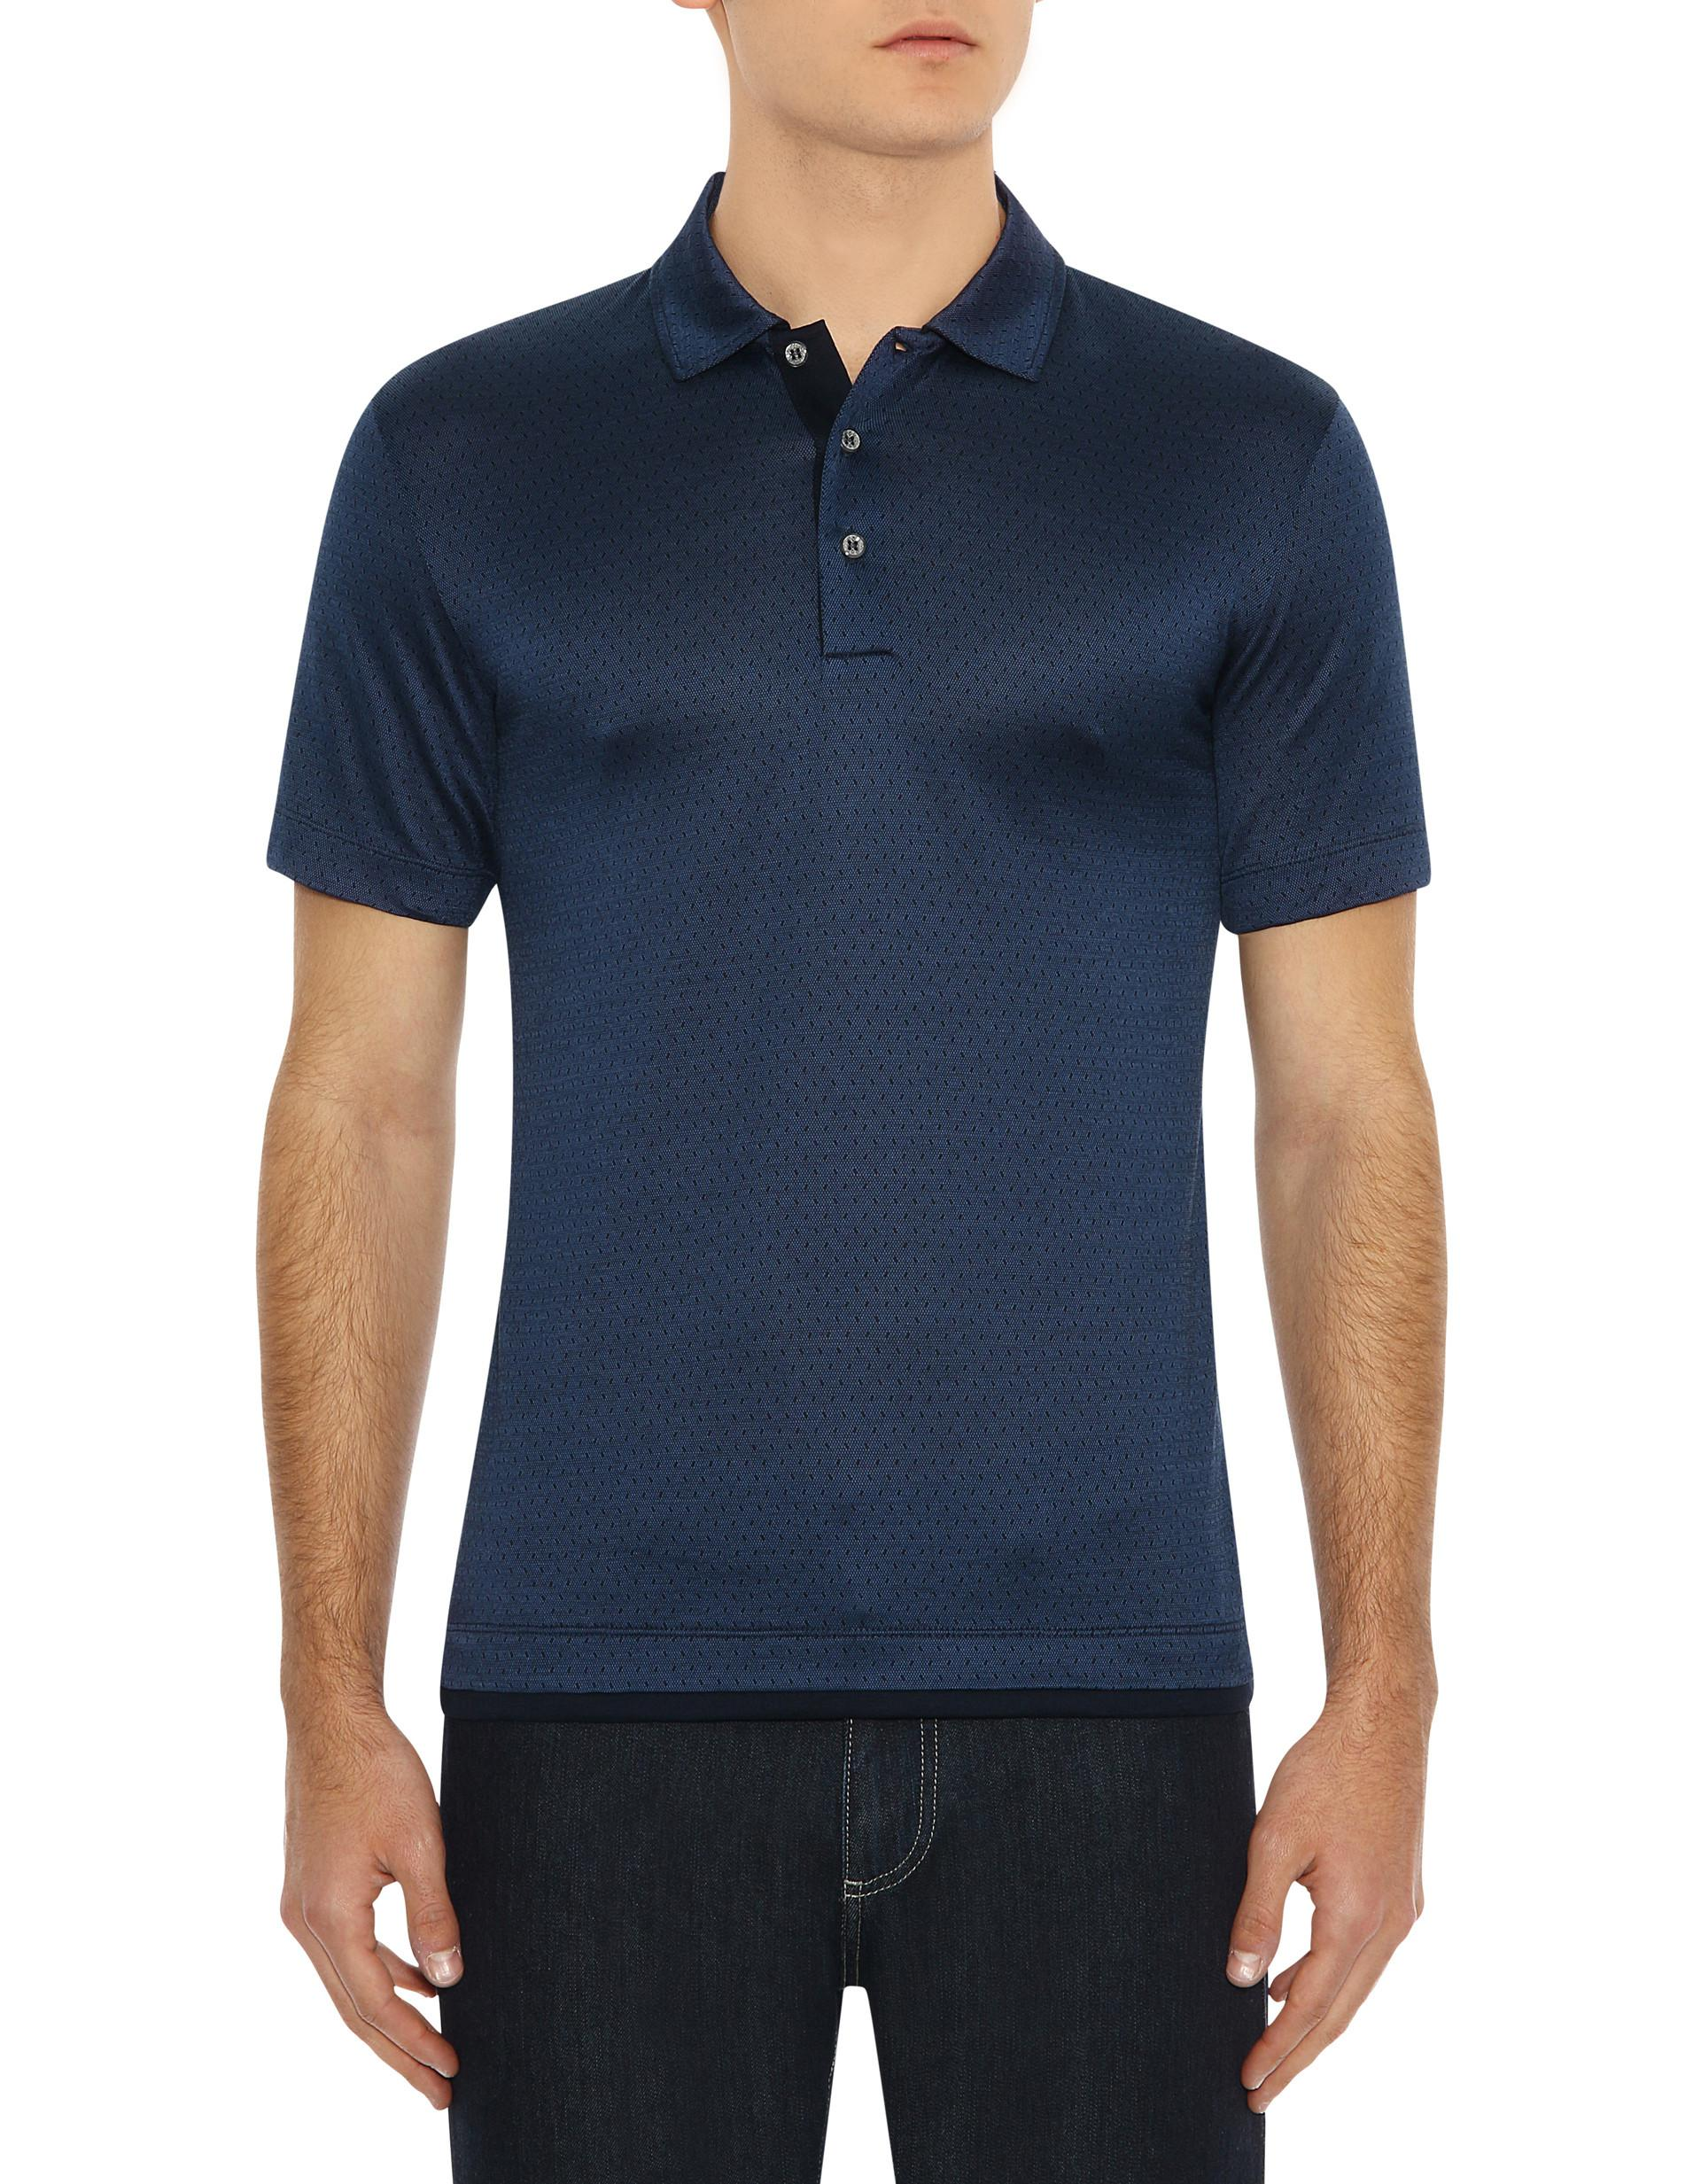 117fd7322ce Canali - Dark Blue Mercerized Cotton Polo Shirt With Micro-motif for Men -  Lyst. View fullscreen